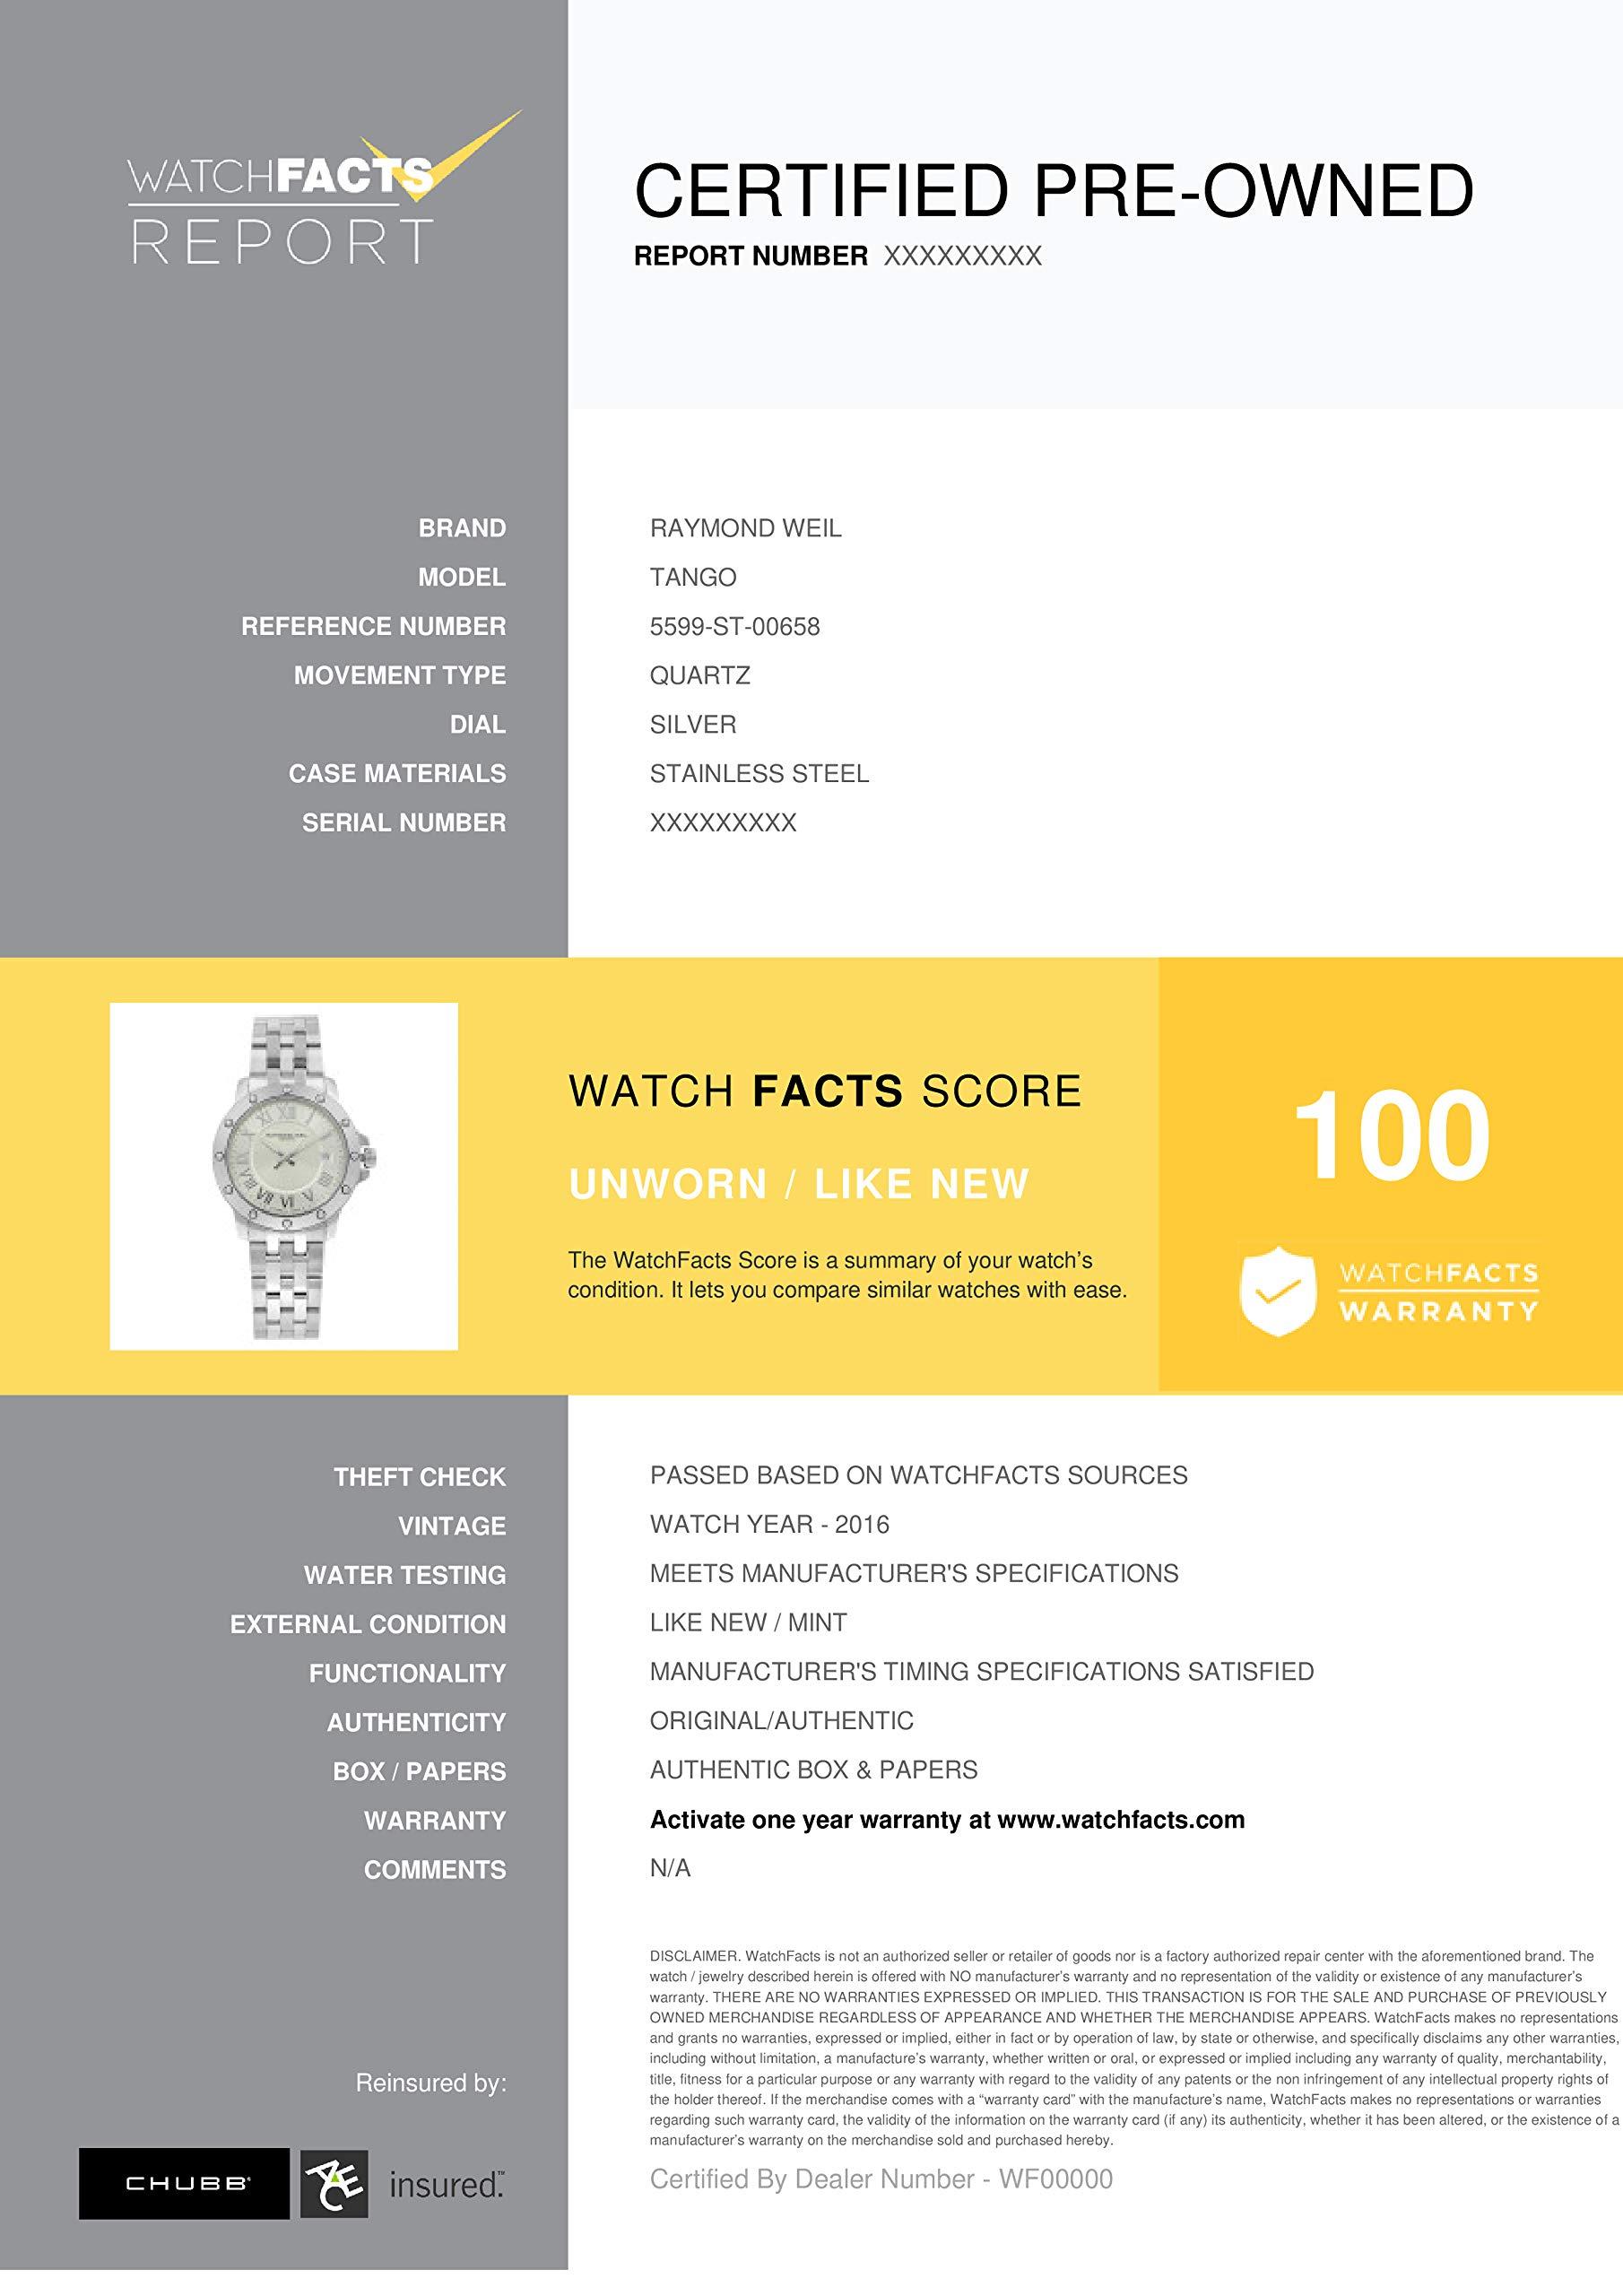 Raymond Weil Tango Quartz Male Watch 5599-ST-00658 (Certified Pre-Owned) by RAYMOND WEIL (Image #6)